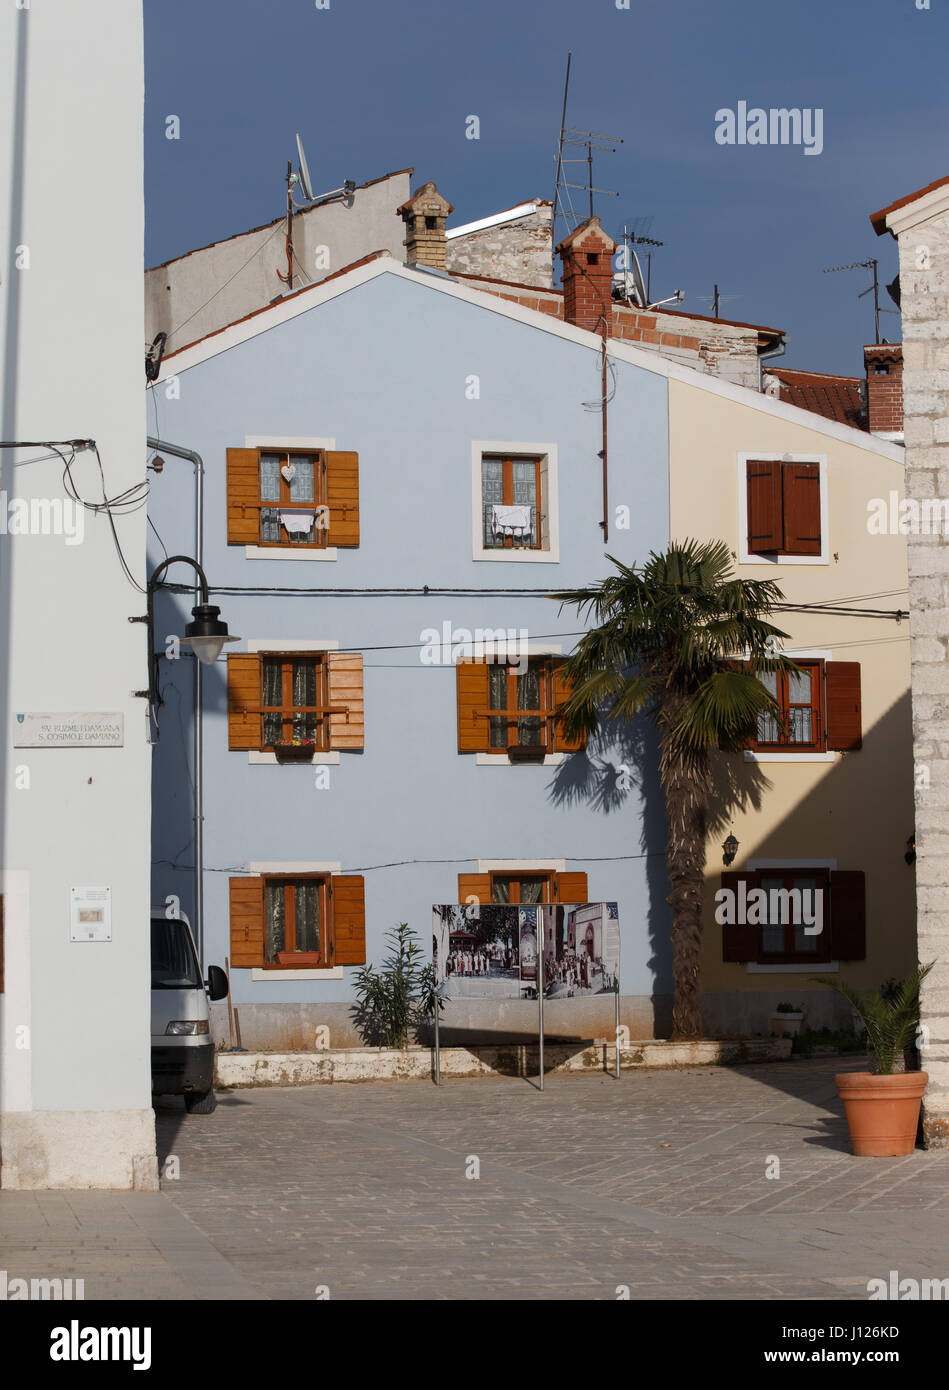 Stadtbild Fasana, Fischerdorf Fažana (italienisch Fasana), Istrien,Kroatien - Stock Image